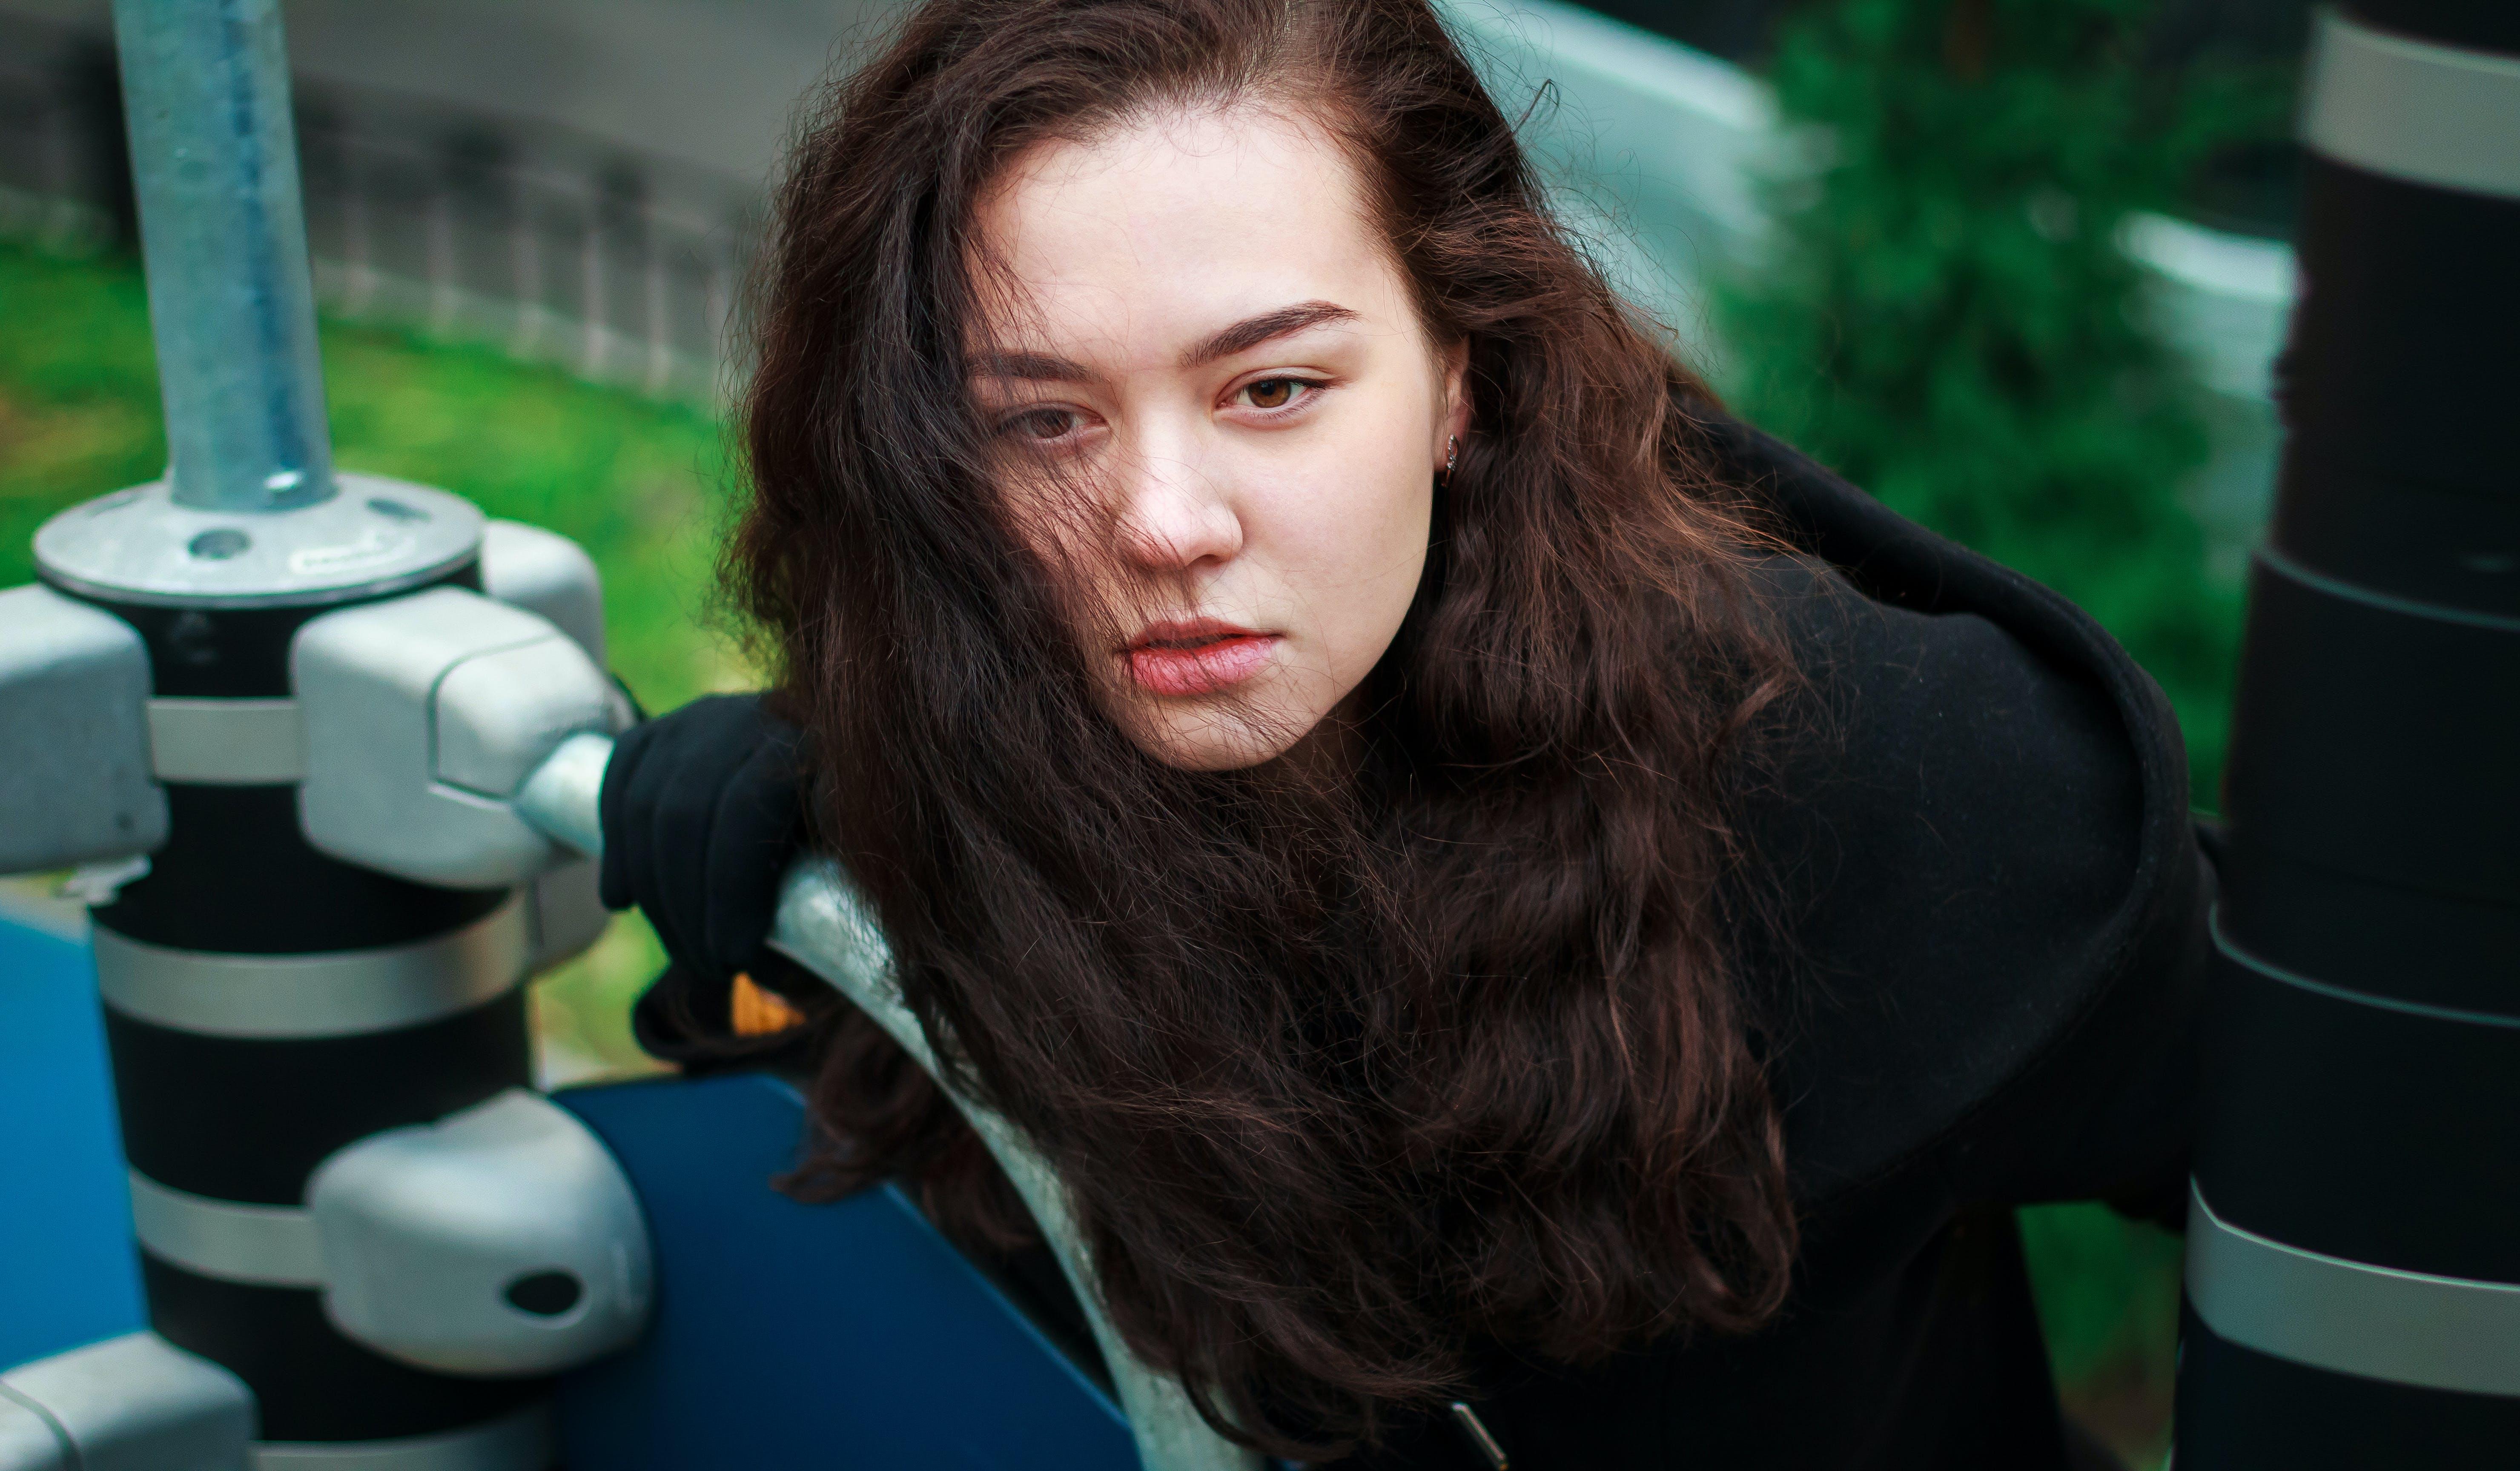 Close-Up Photo Of Woman